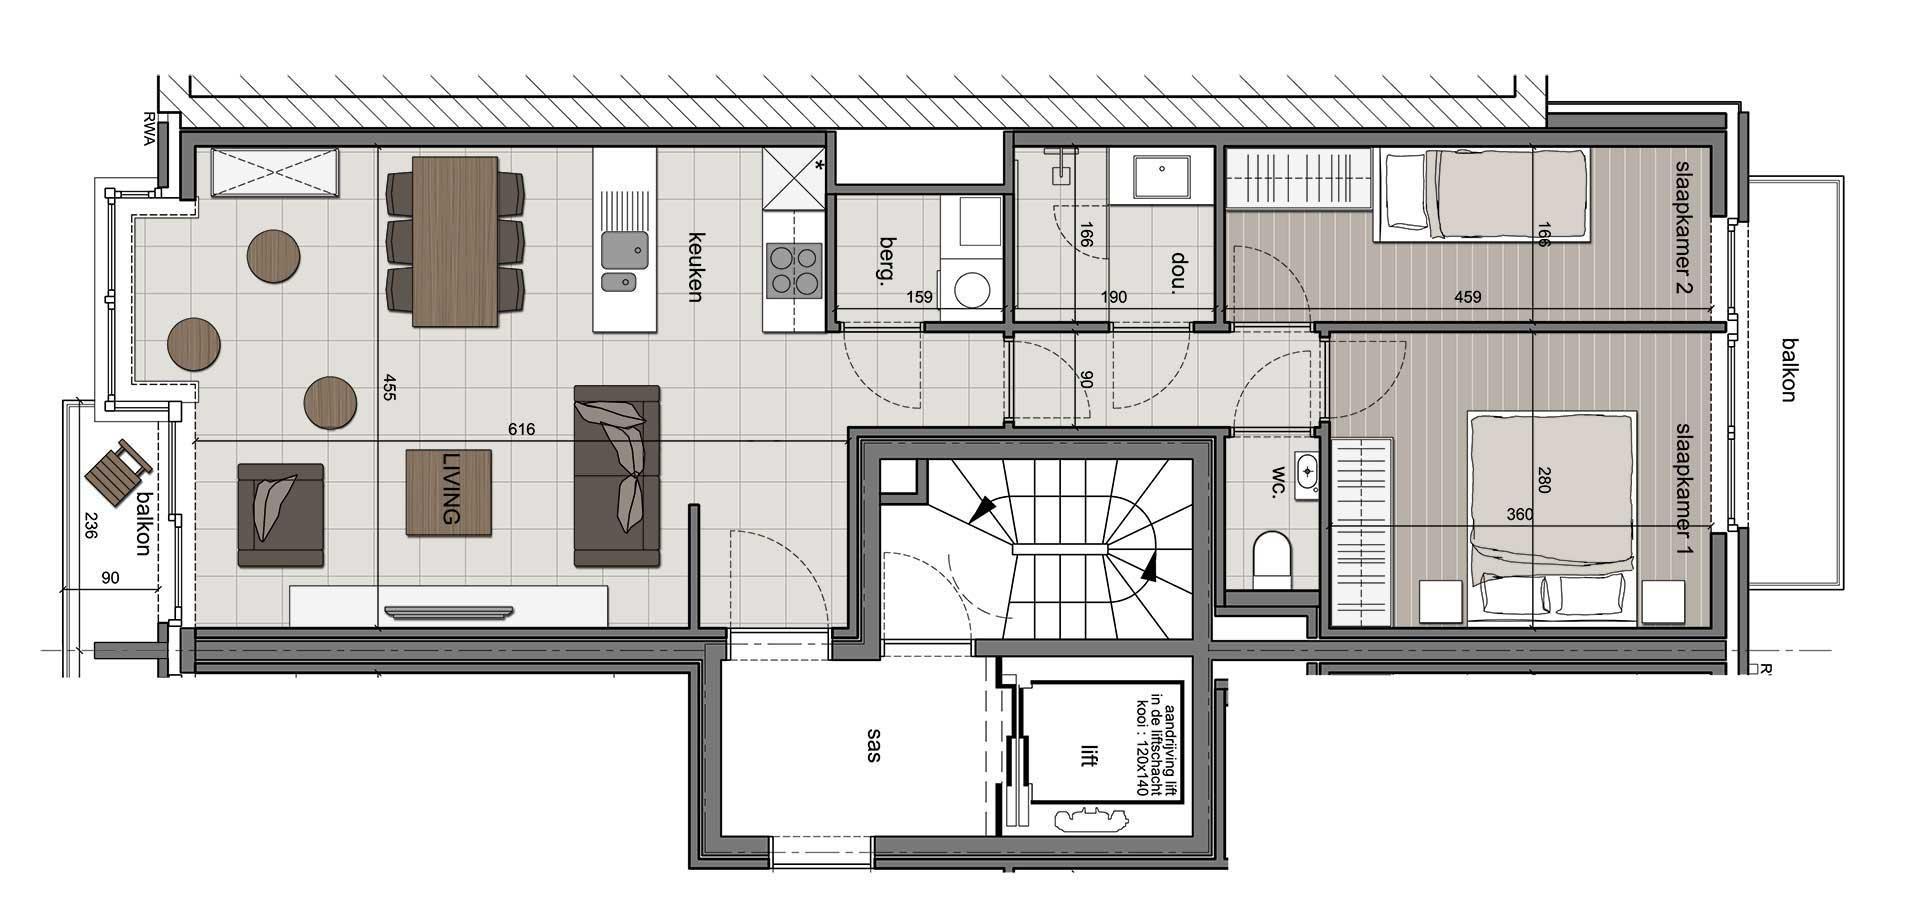 Residentie <br /> Winoc - image appartement-te-koop-koksijde-residentie-winoc-3.1-4.1 on https://hoprom.be